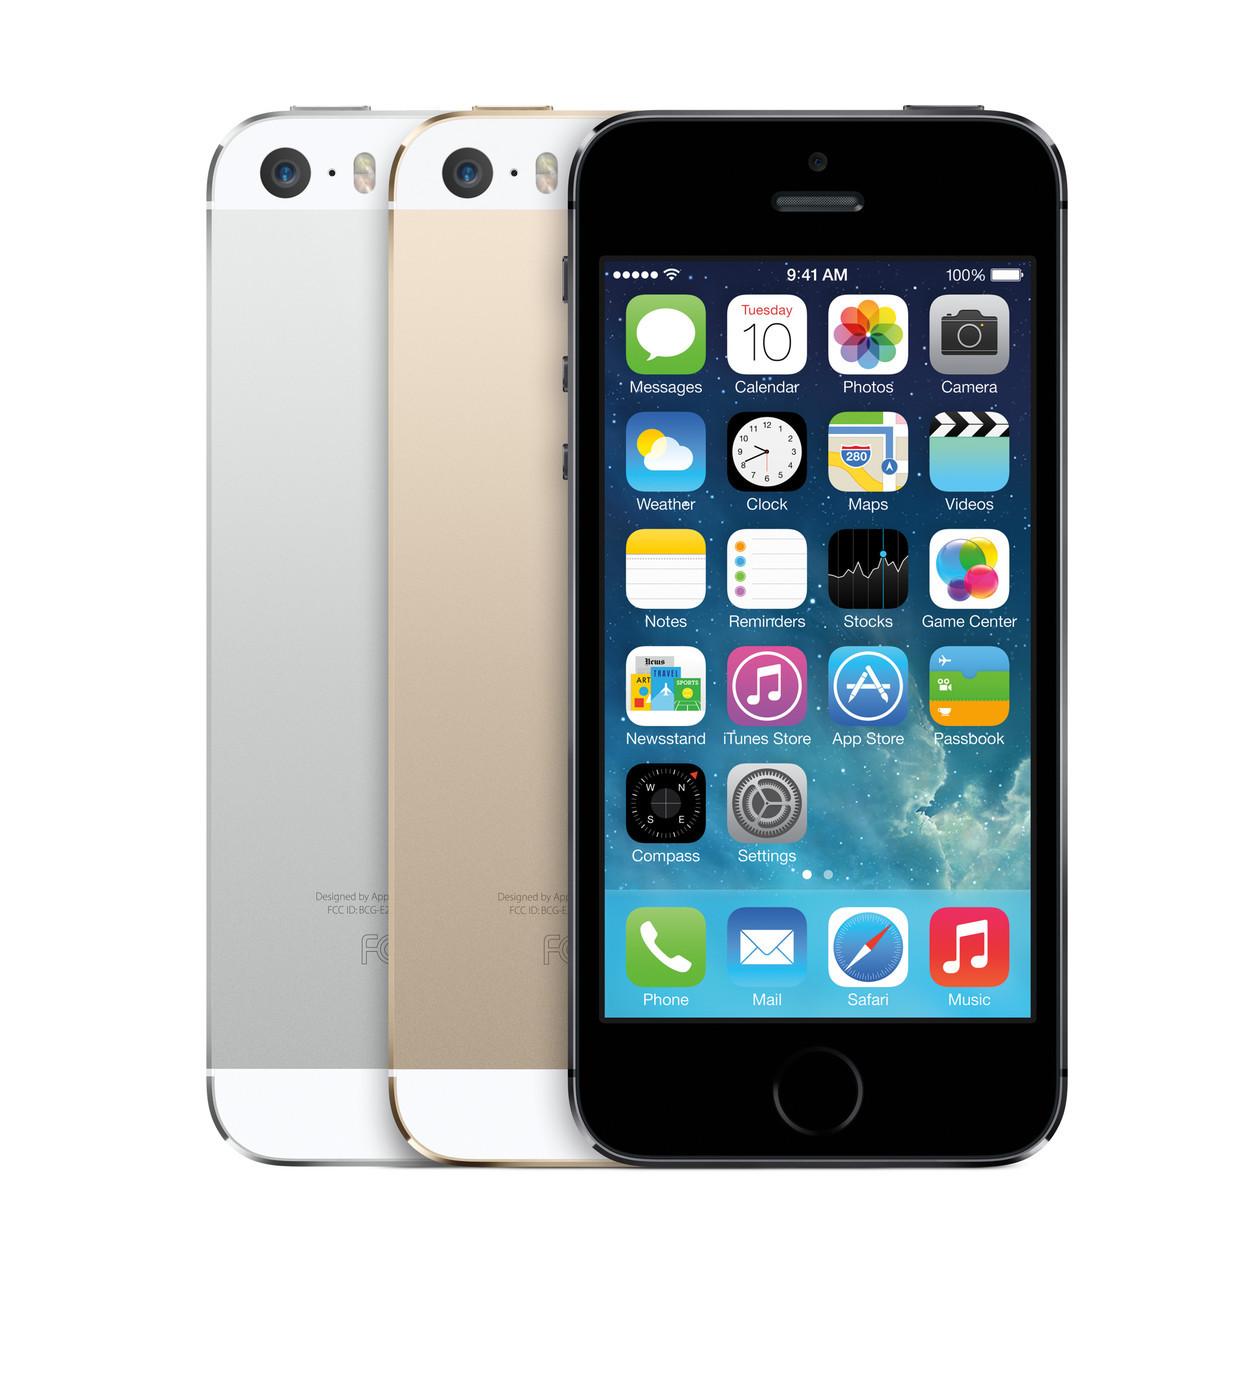 1379193684_iphone-5s-colors.jpg